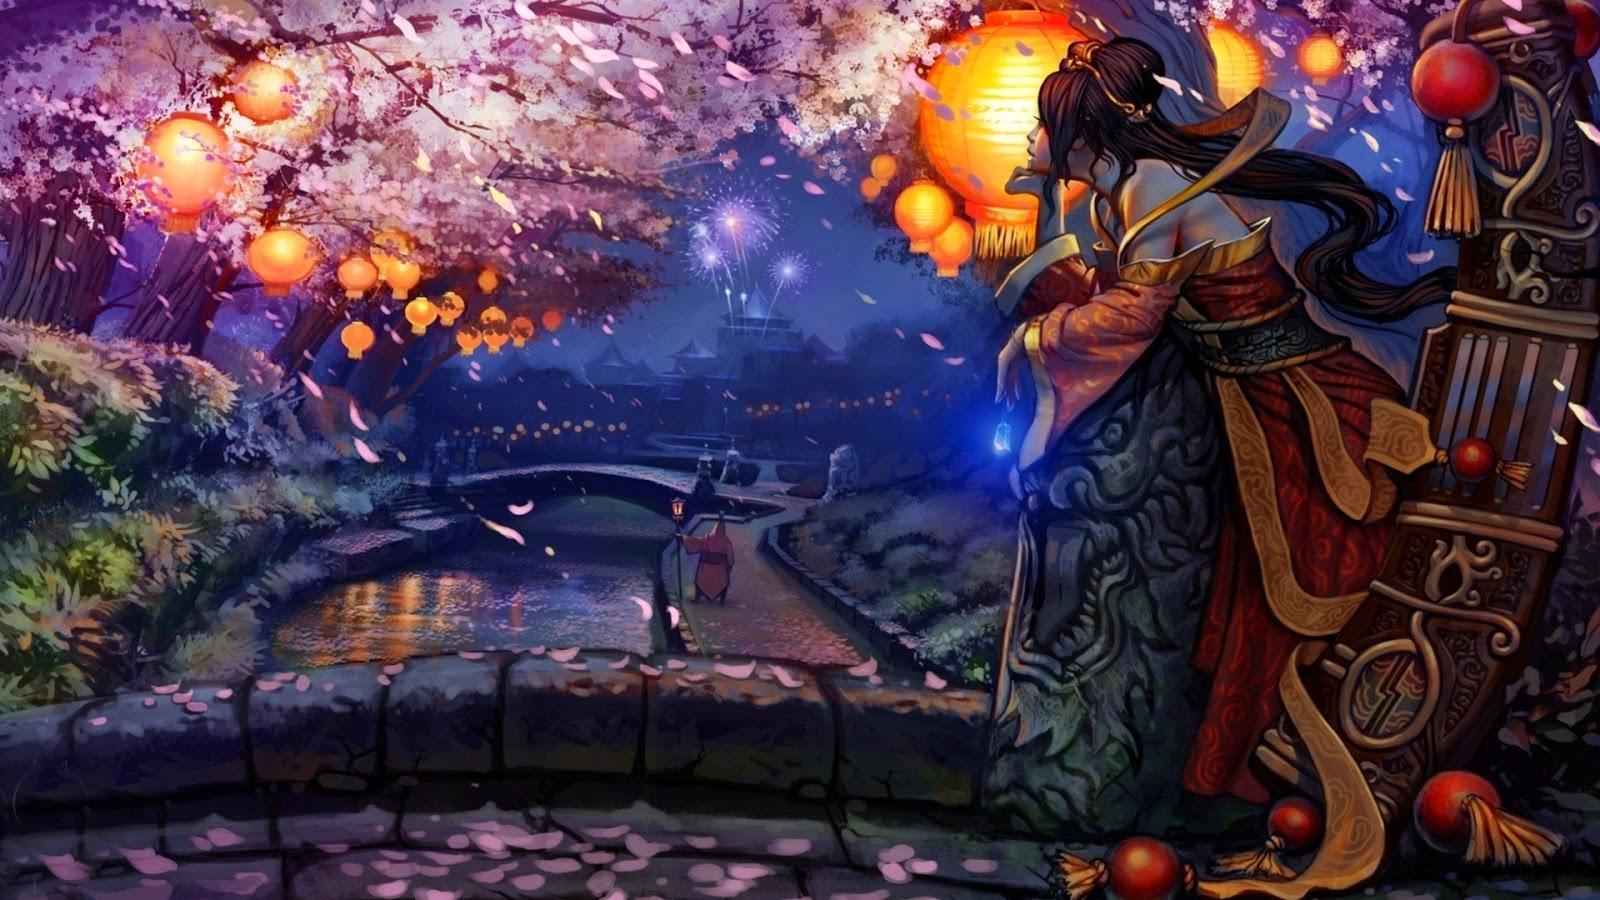 Sona League of Legends Wallpaper, Sona Desktop Wallpaper